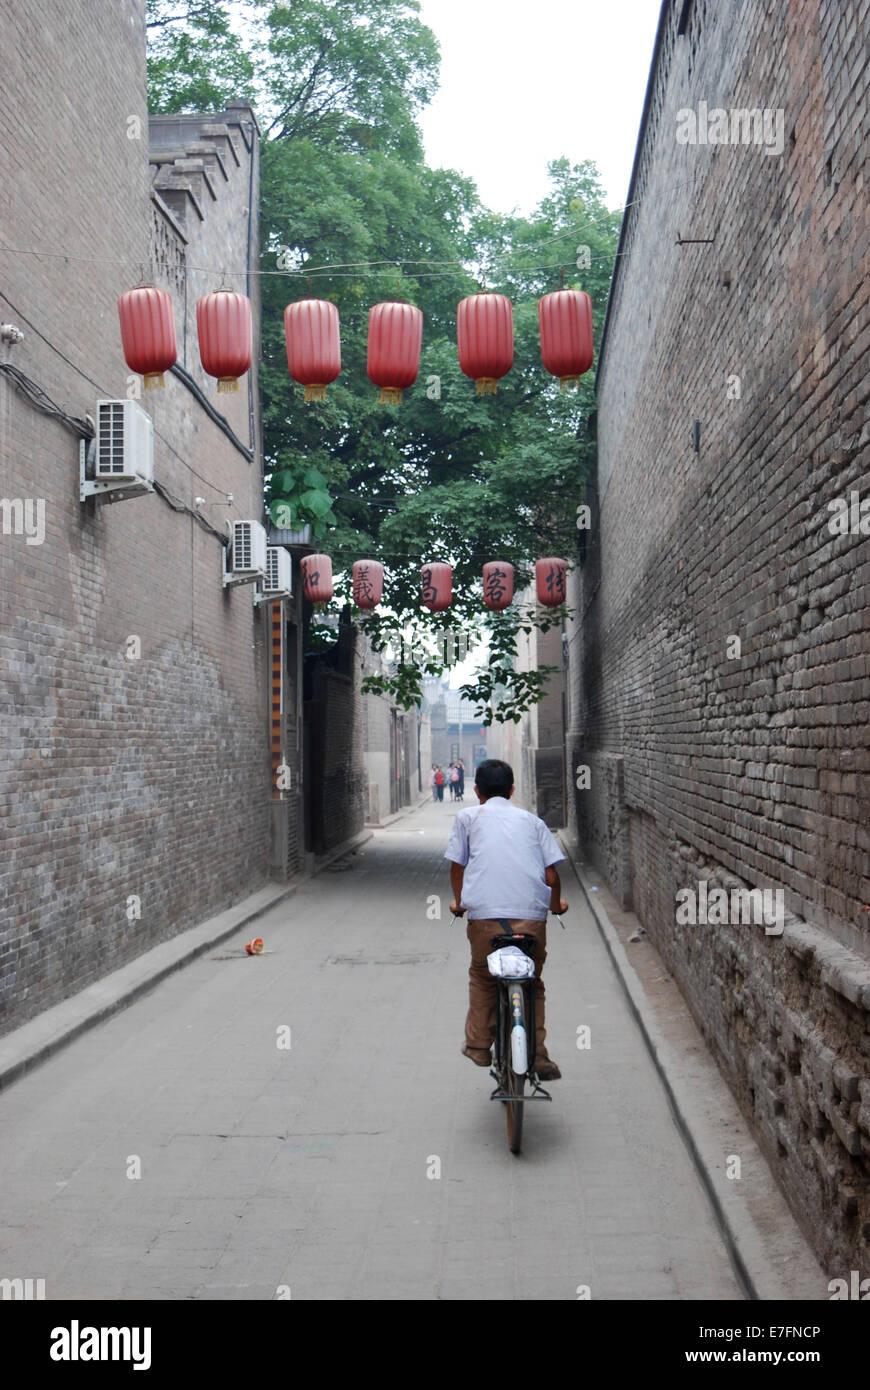 Hutong, China Beijing 2014 - Stock Image